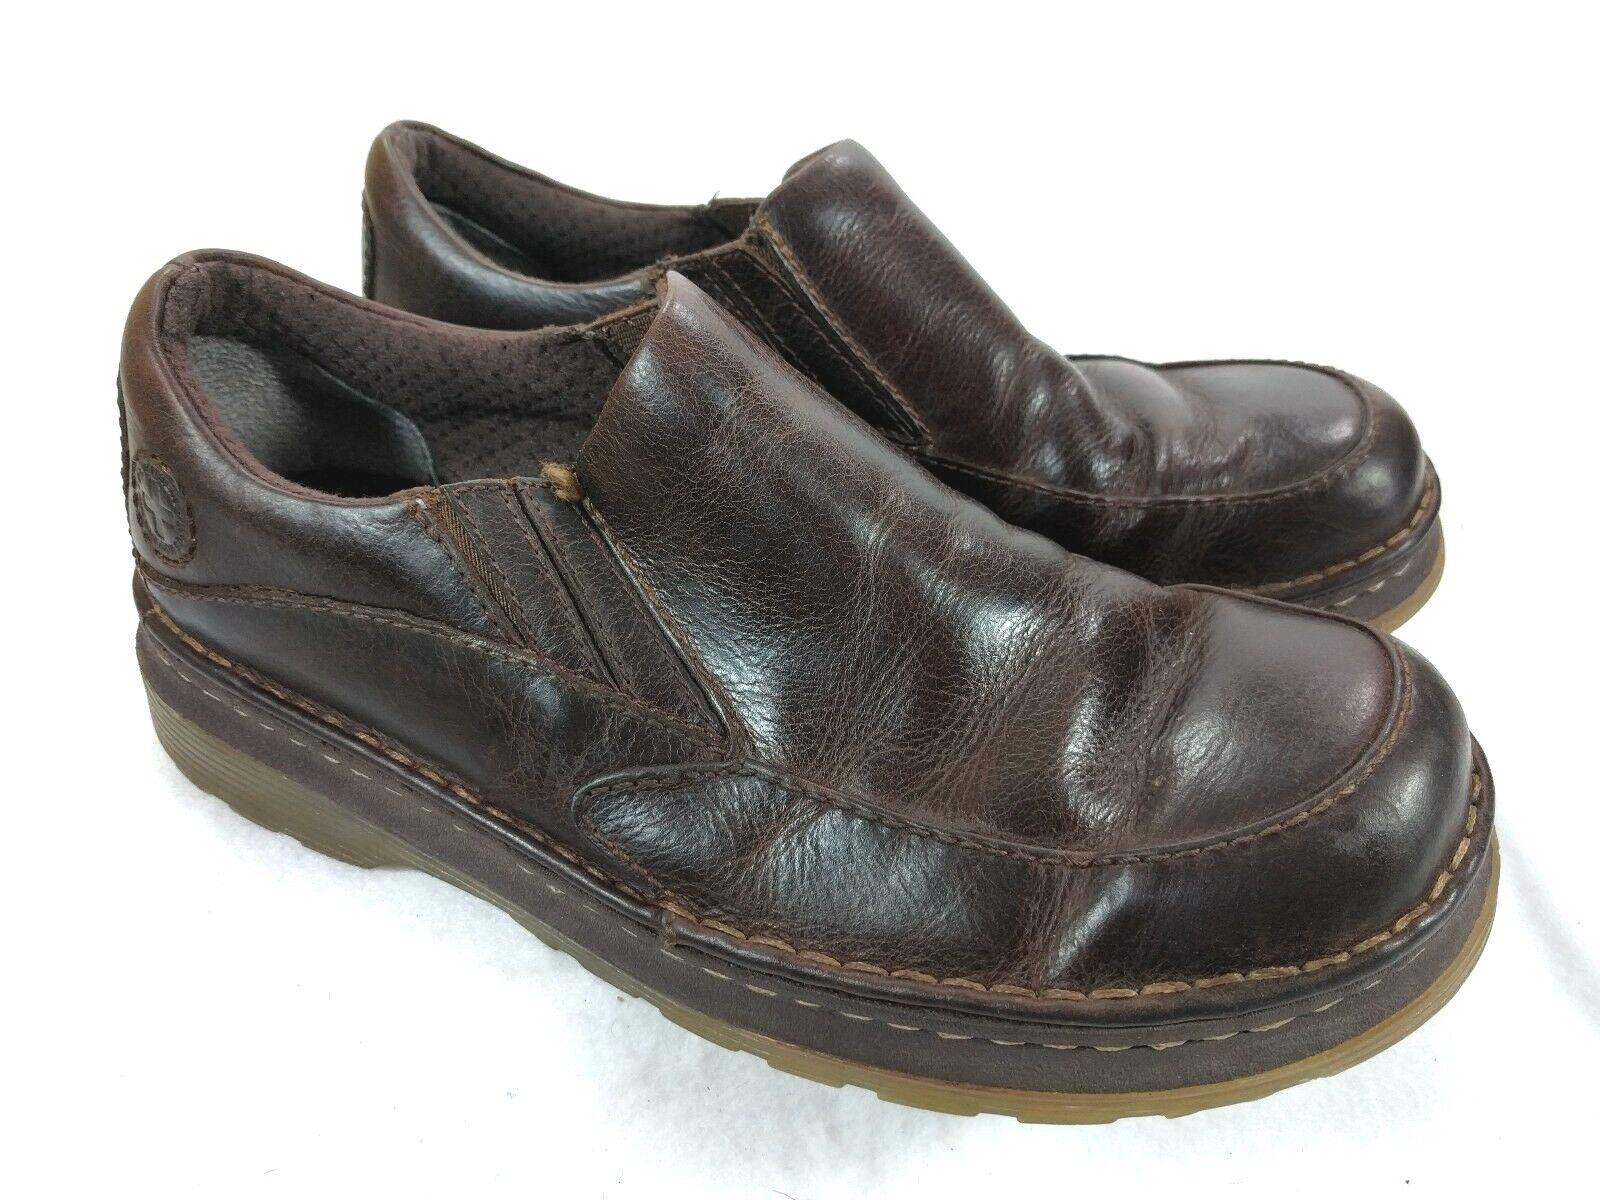 DR. MARTENS Neil Men's Size US 8 Brown Leather Loafers Moc Toe Slip-On